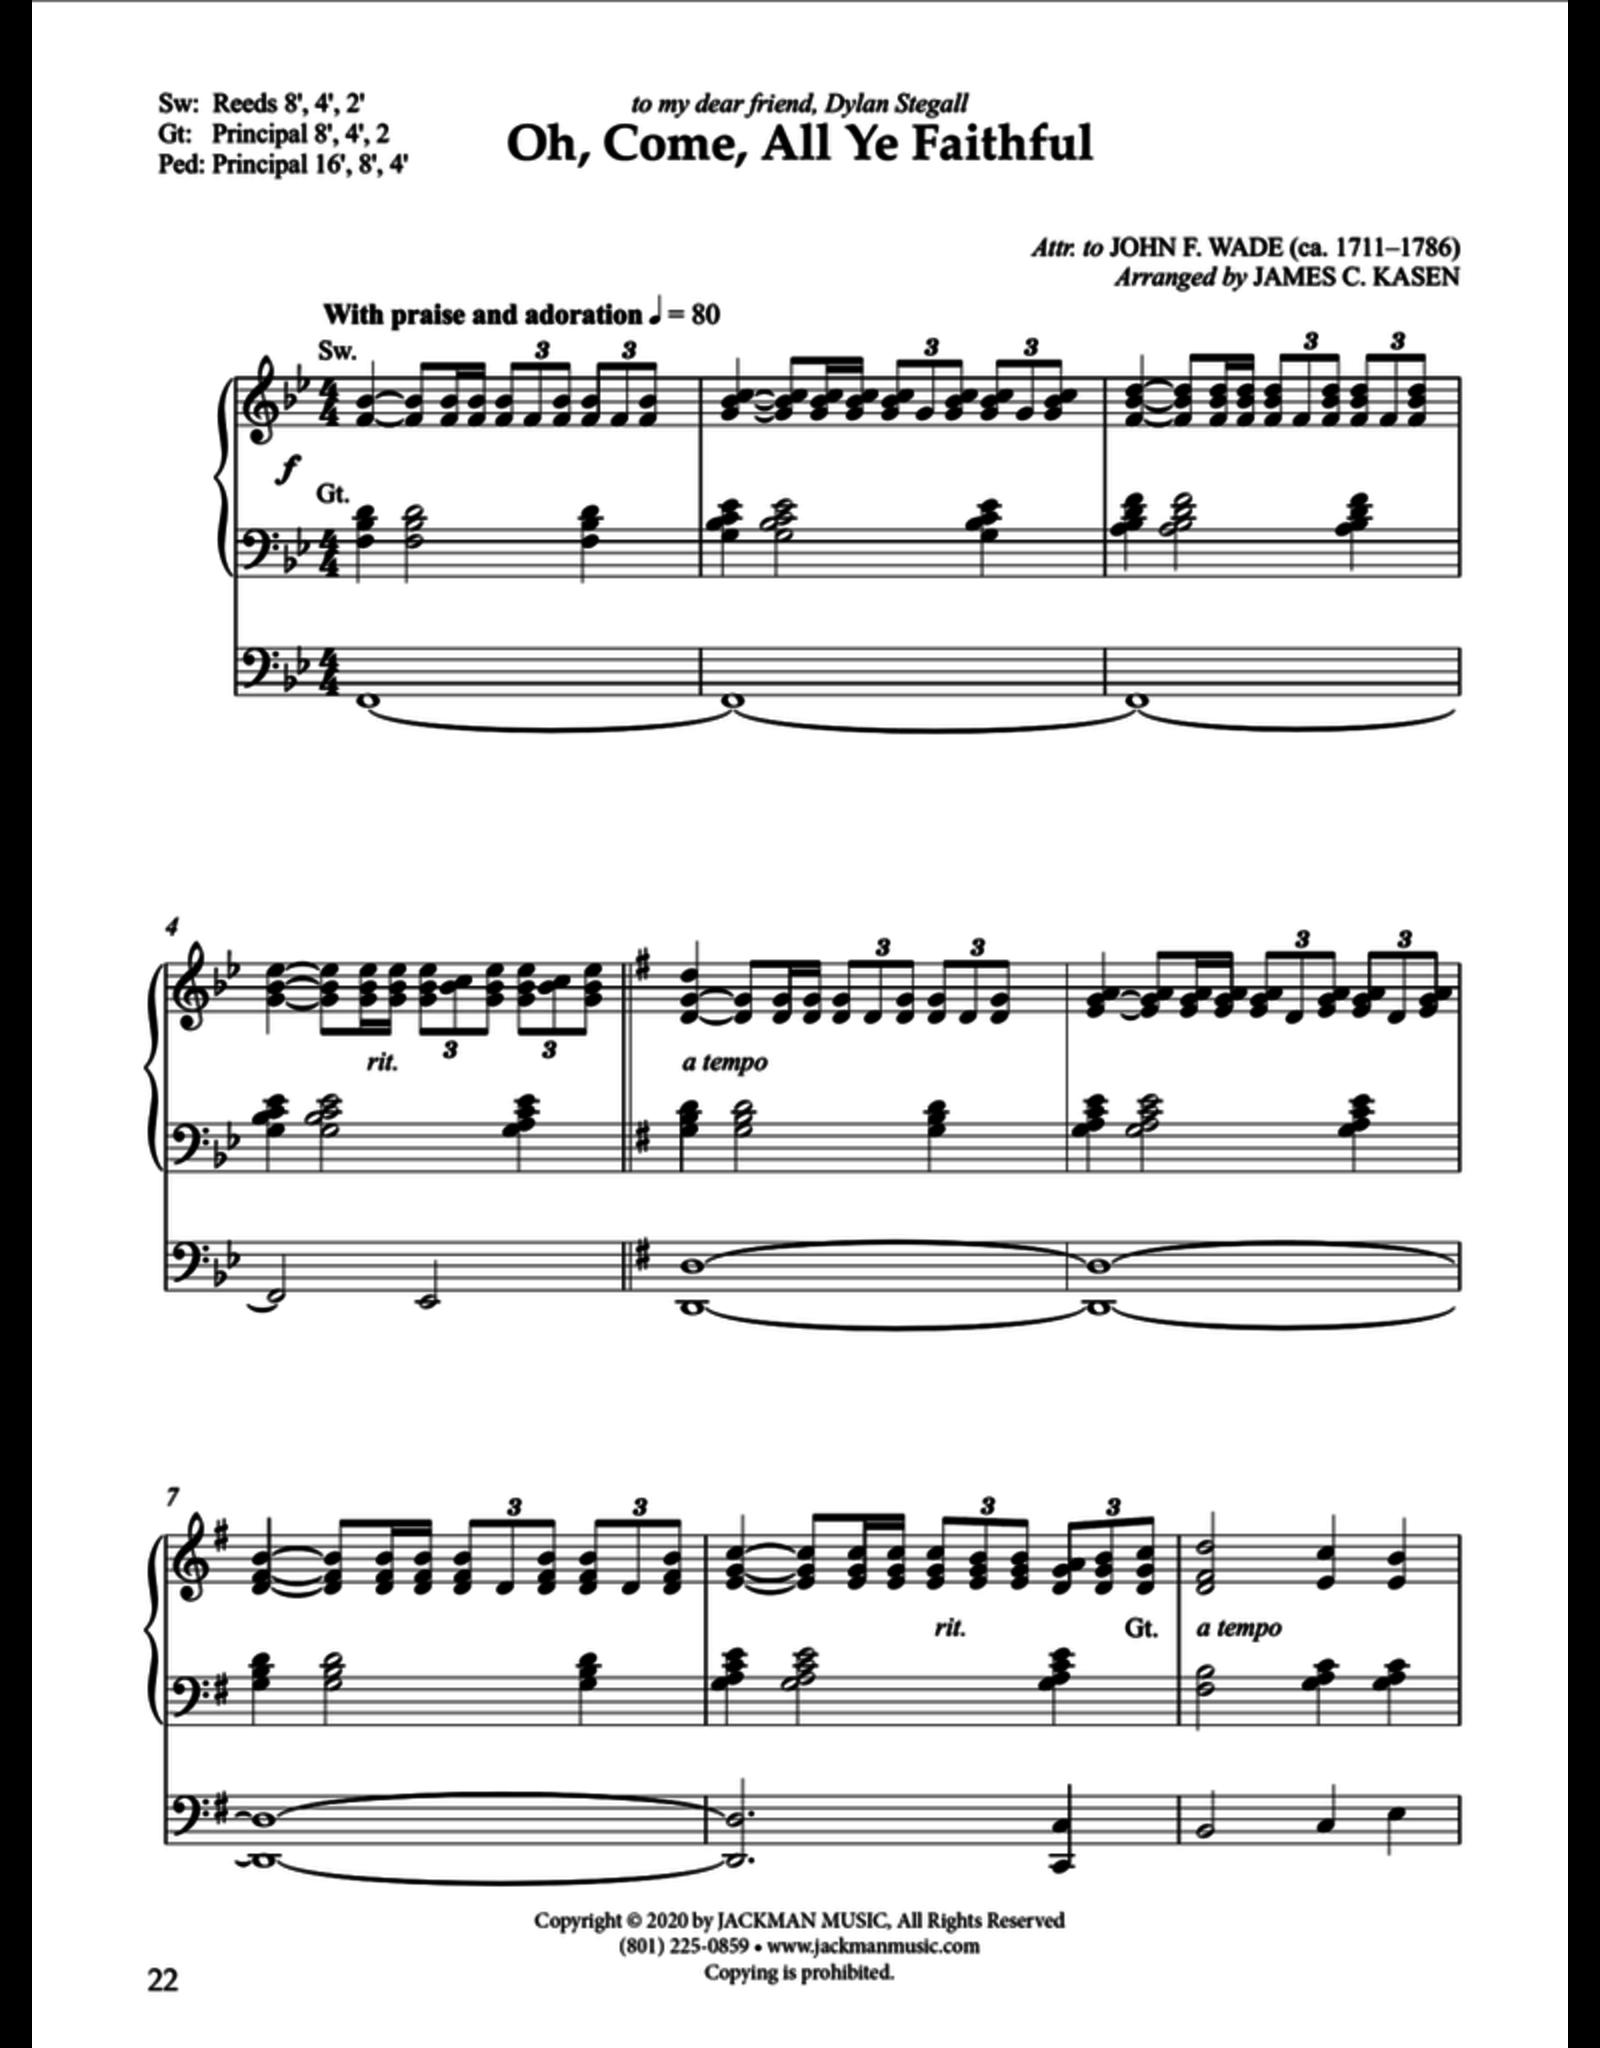 Jackman Music Christmas Postludes for Organ Vol. 2 arr. James Kasen